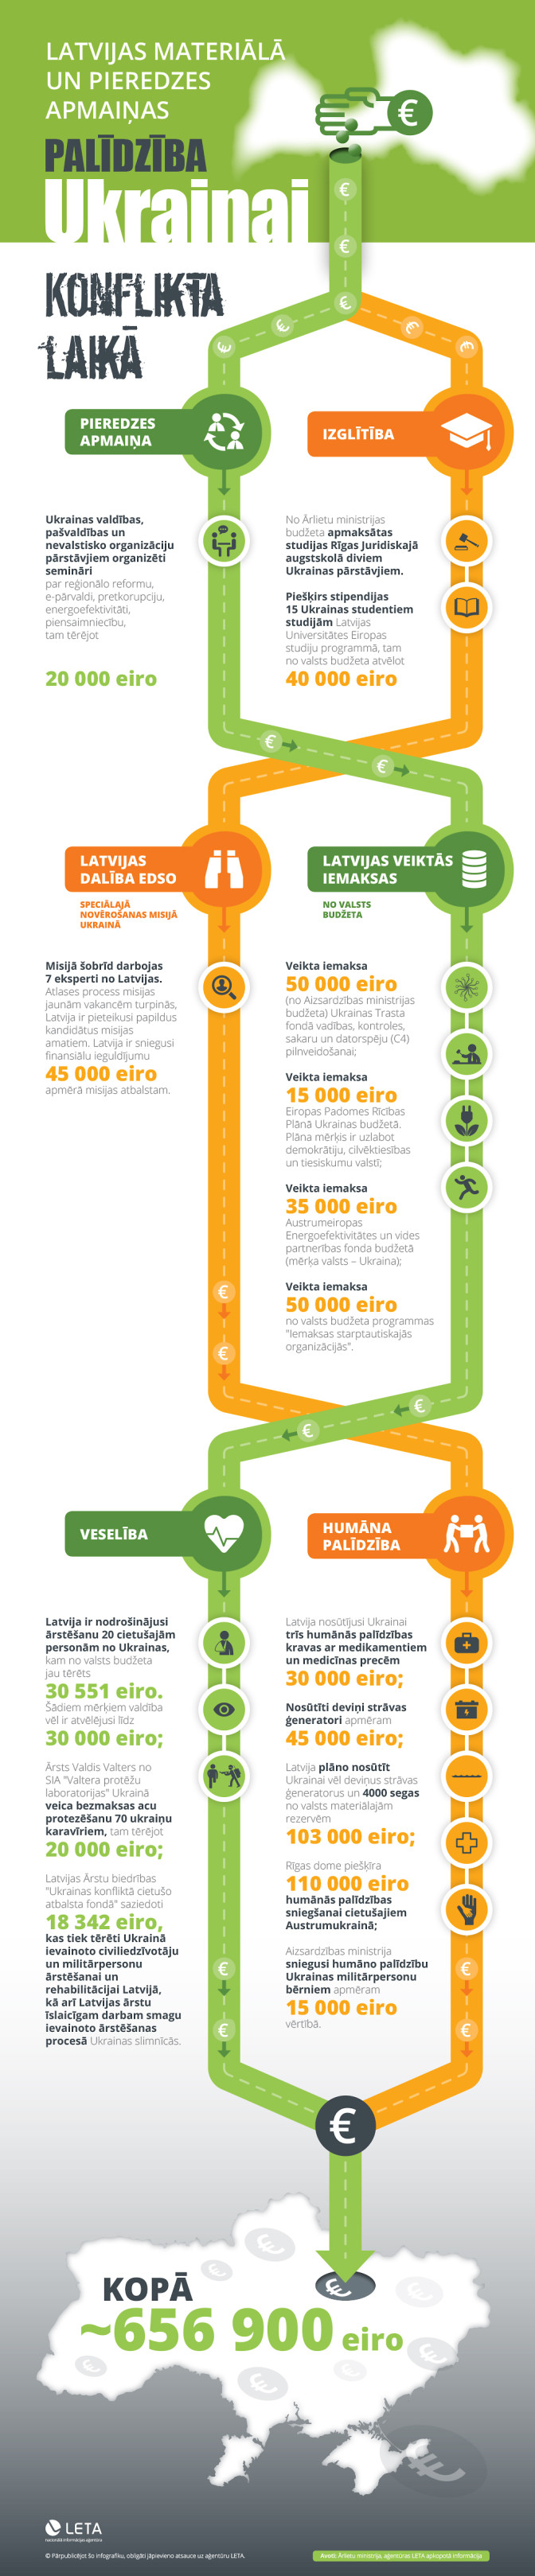 Infografika: LETA